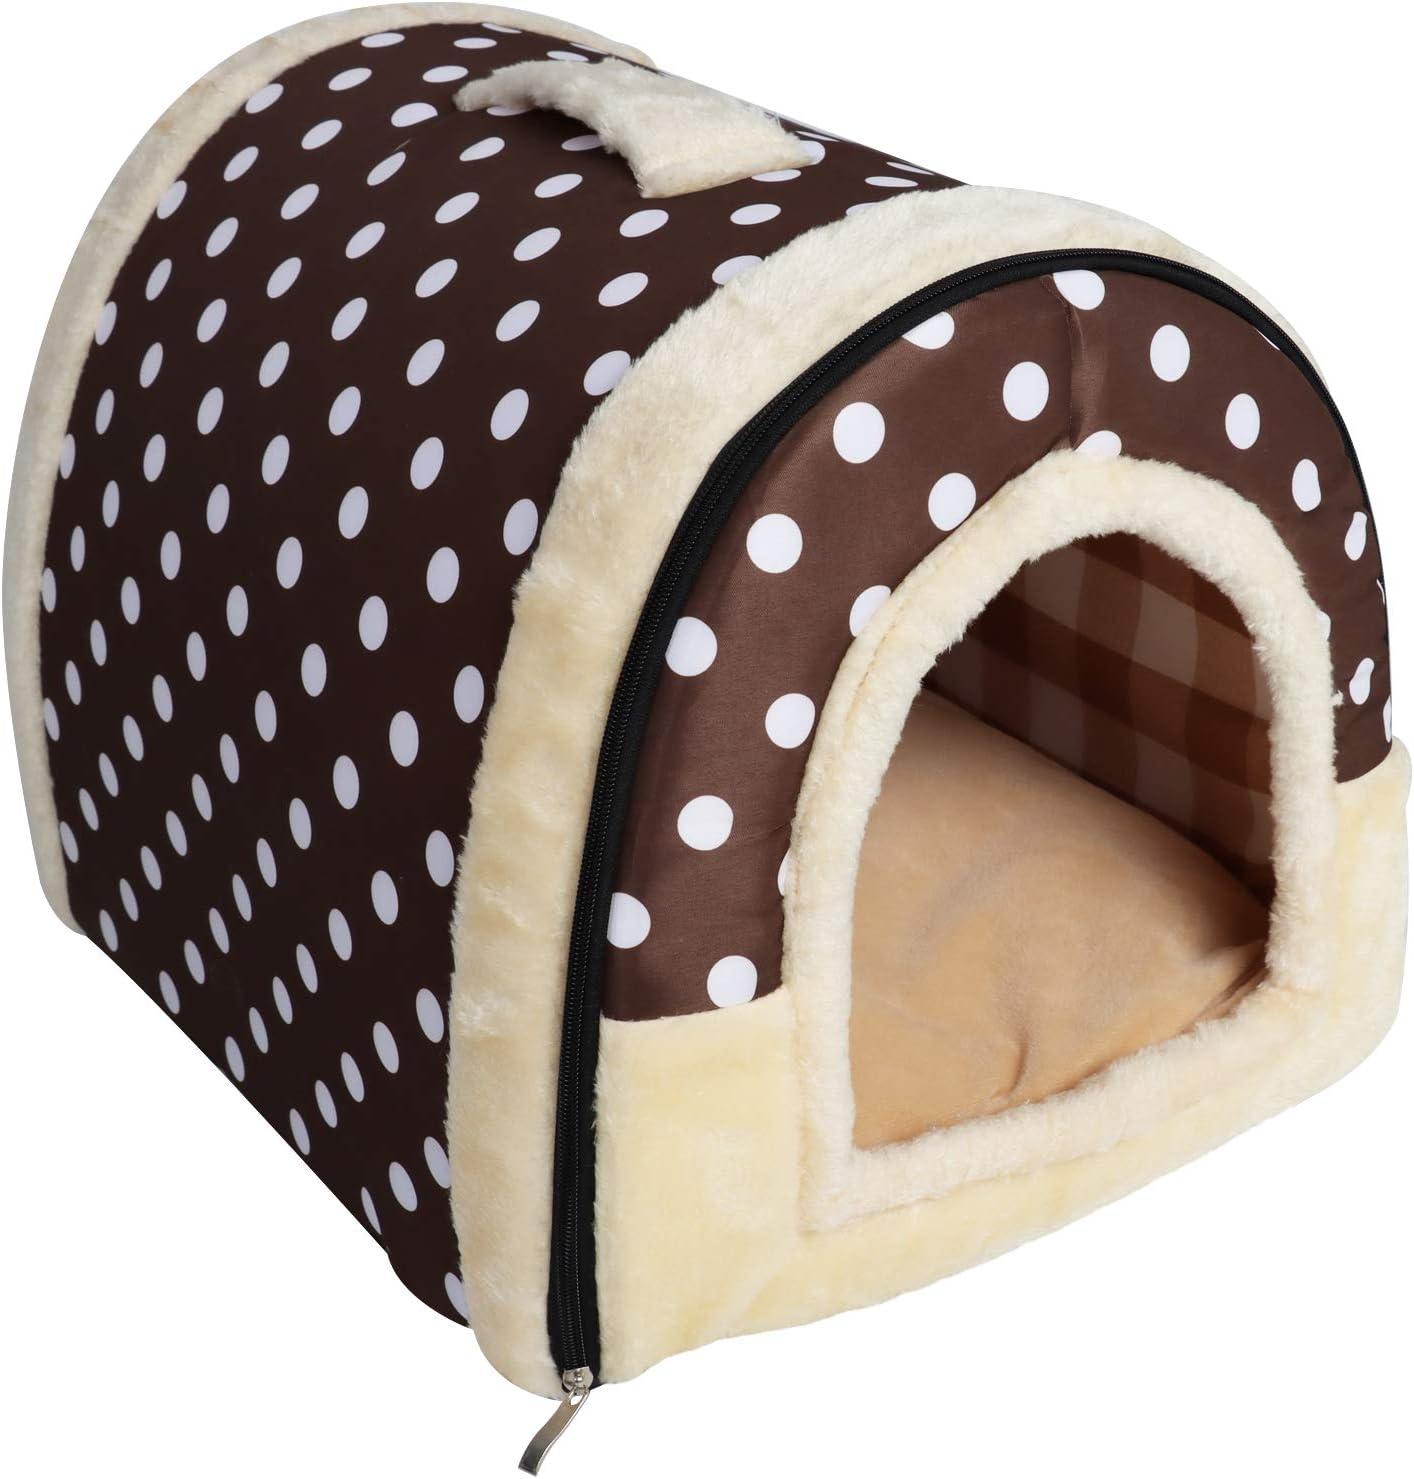 YouthUnion Cama para Mascota, Casa Estera Casera Diseño de Triángulo Edredón Máquina Saco de Dormir Caliente Lavable Cómoda para Gatito Gatos Perros Cachorro Conejo Invierno (L, Color 2)